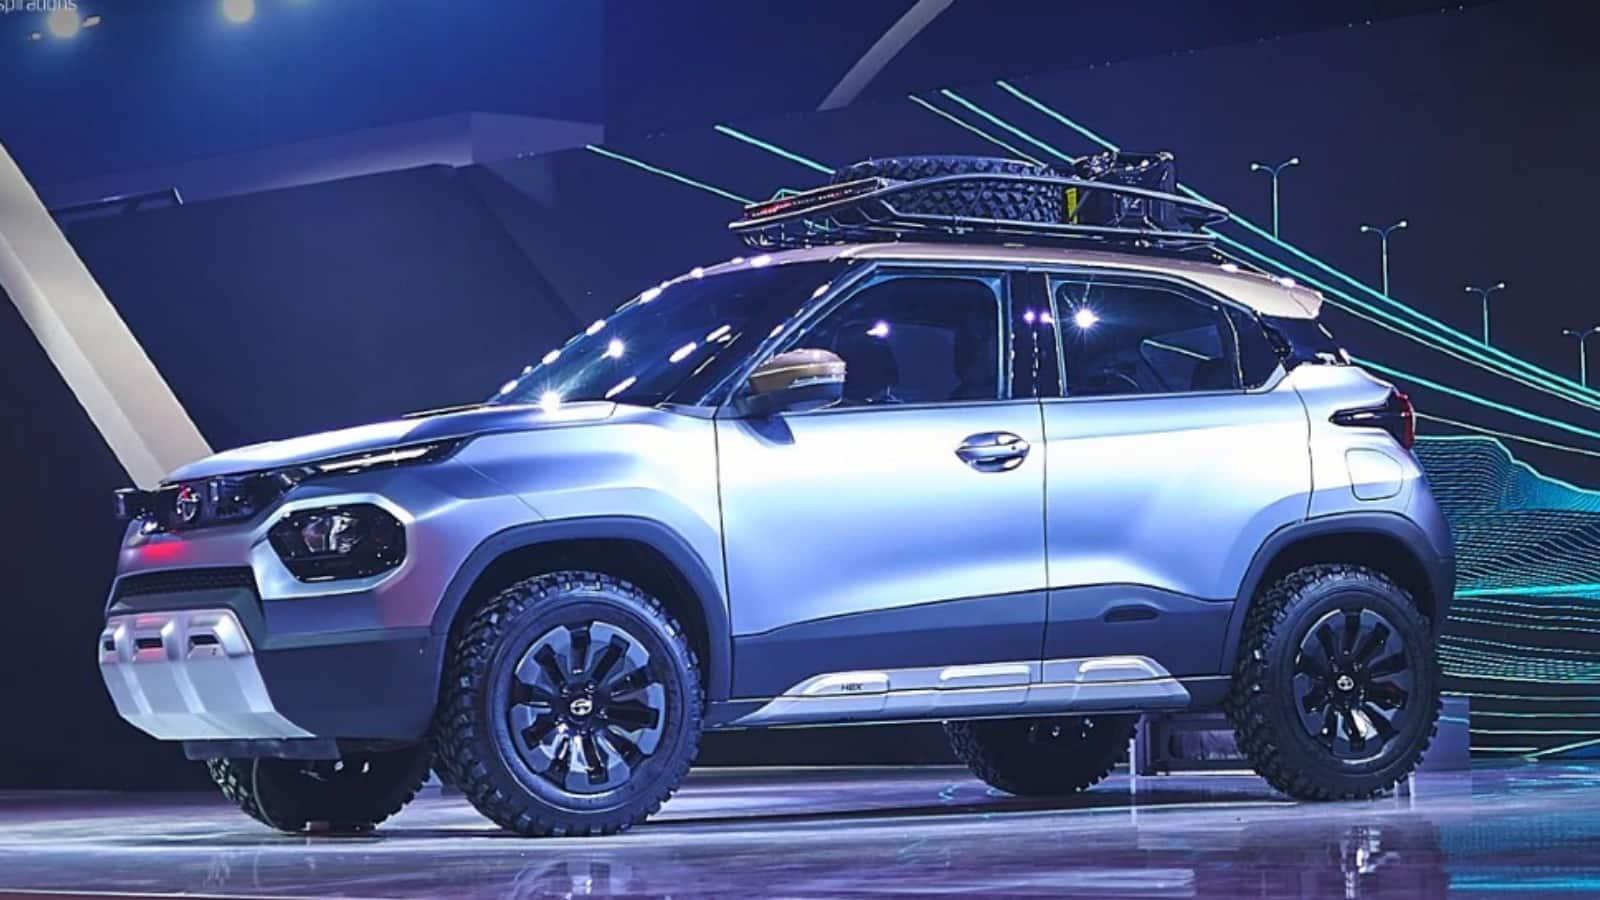 Tata HBX speculated engine details